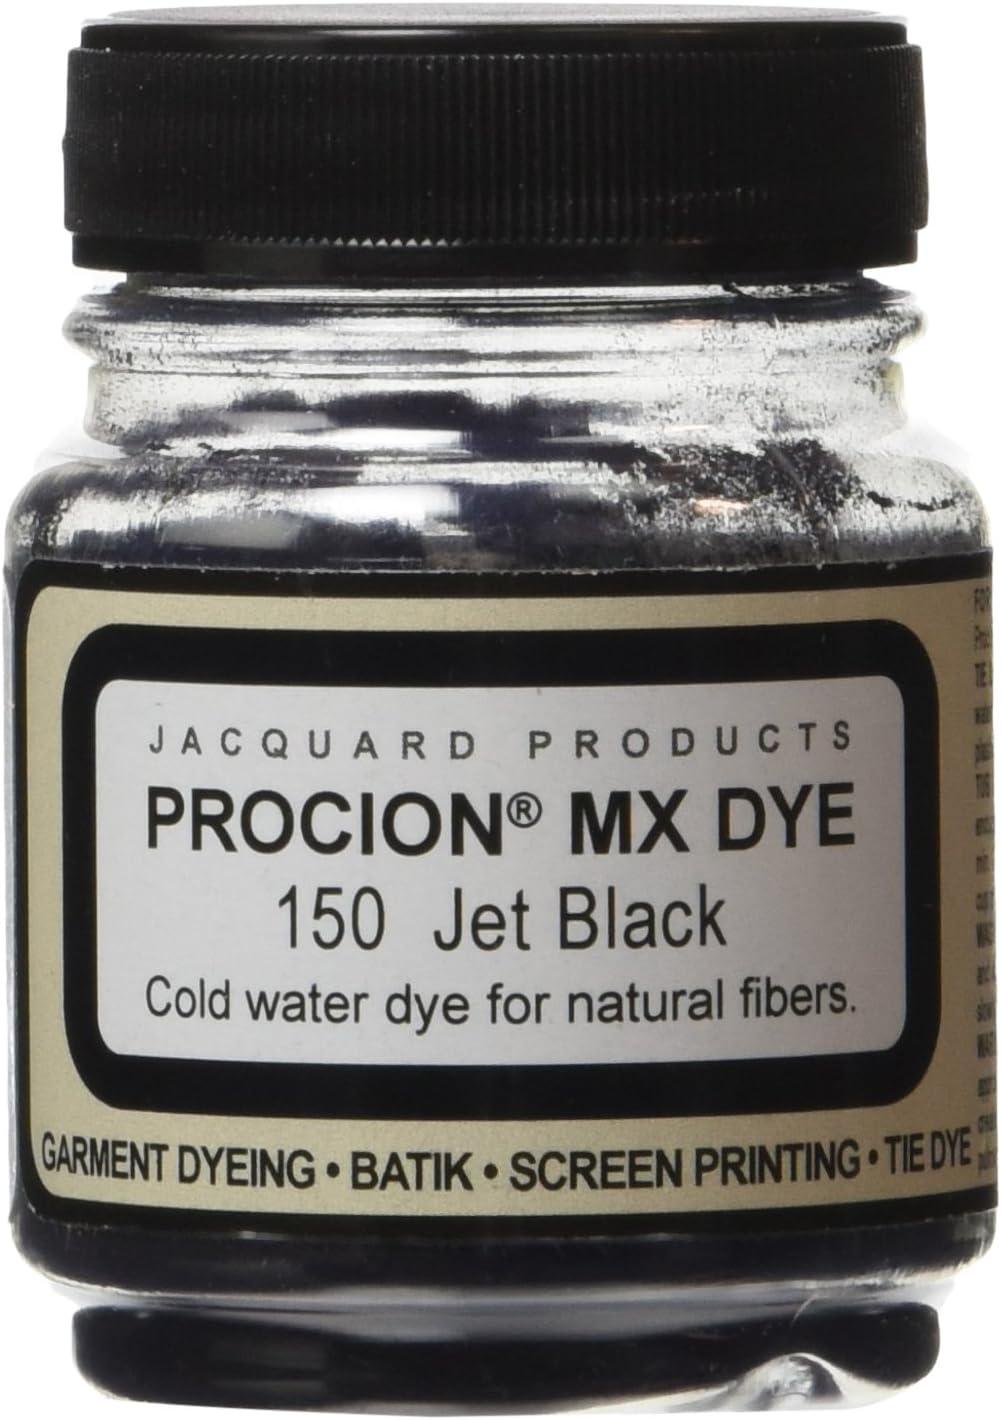 Jacquard Procion MX Fiber Reactive Dye 2 3rd ounce Jar (Jet Black)